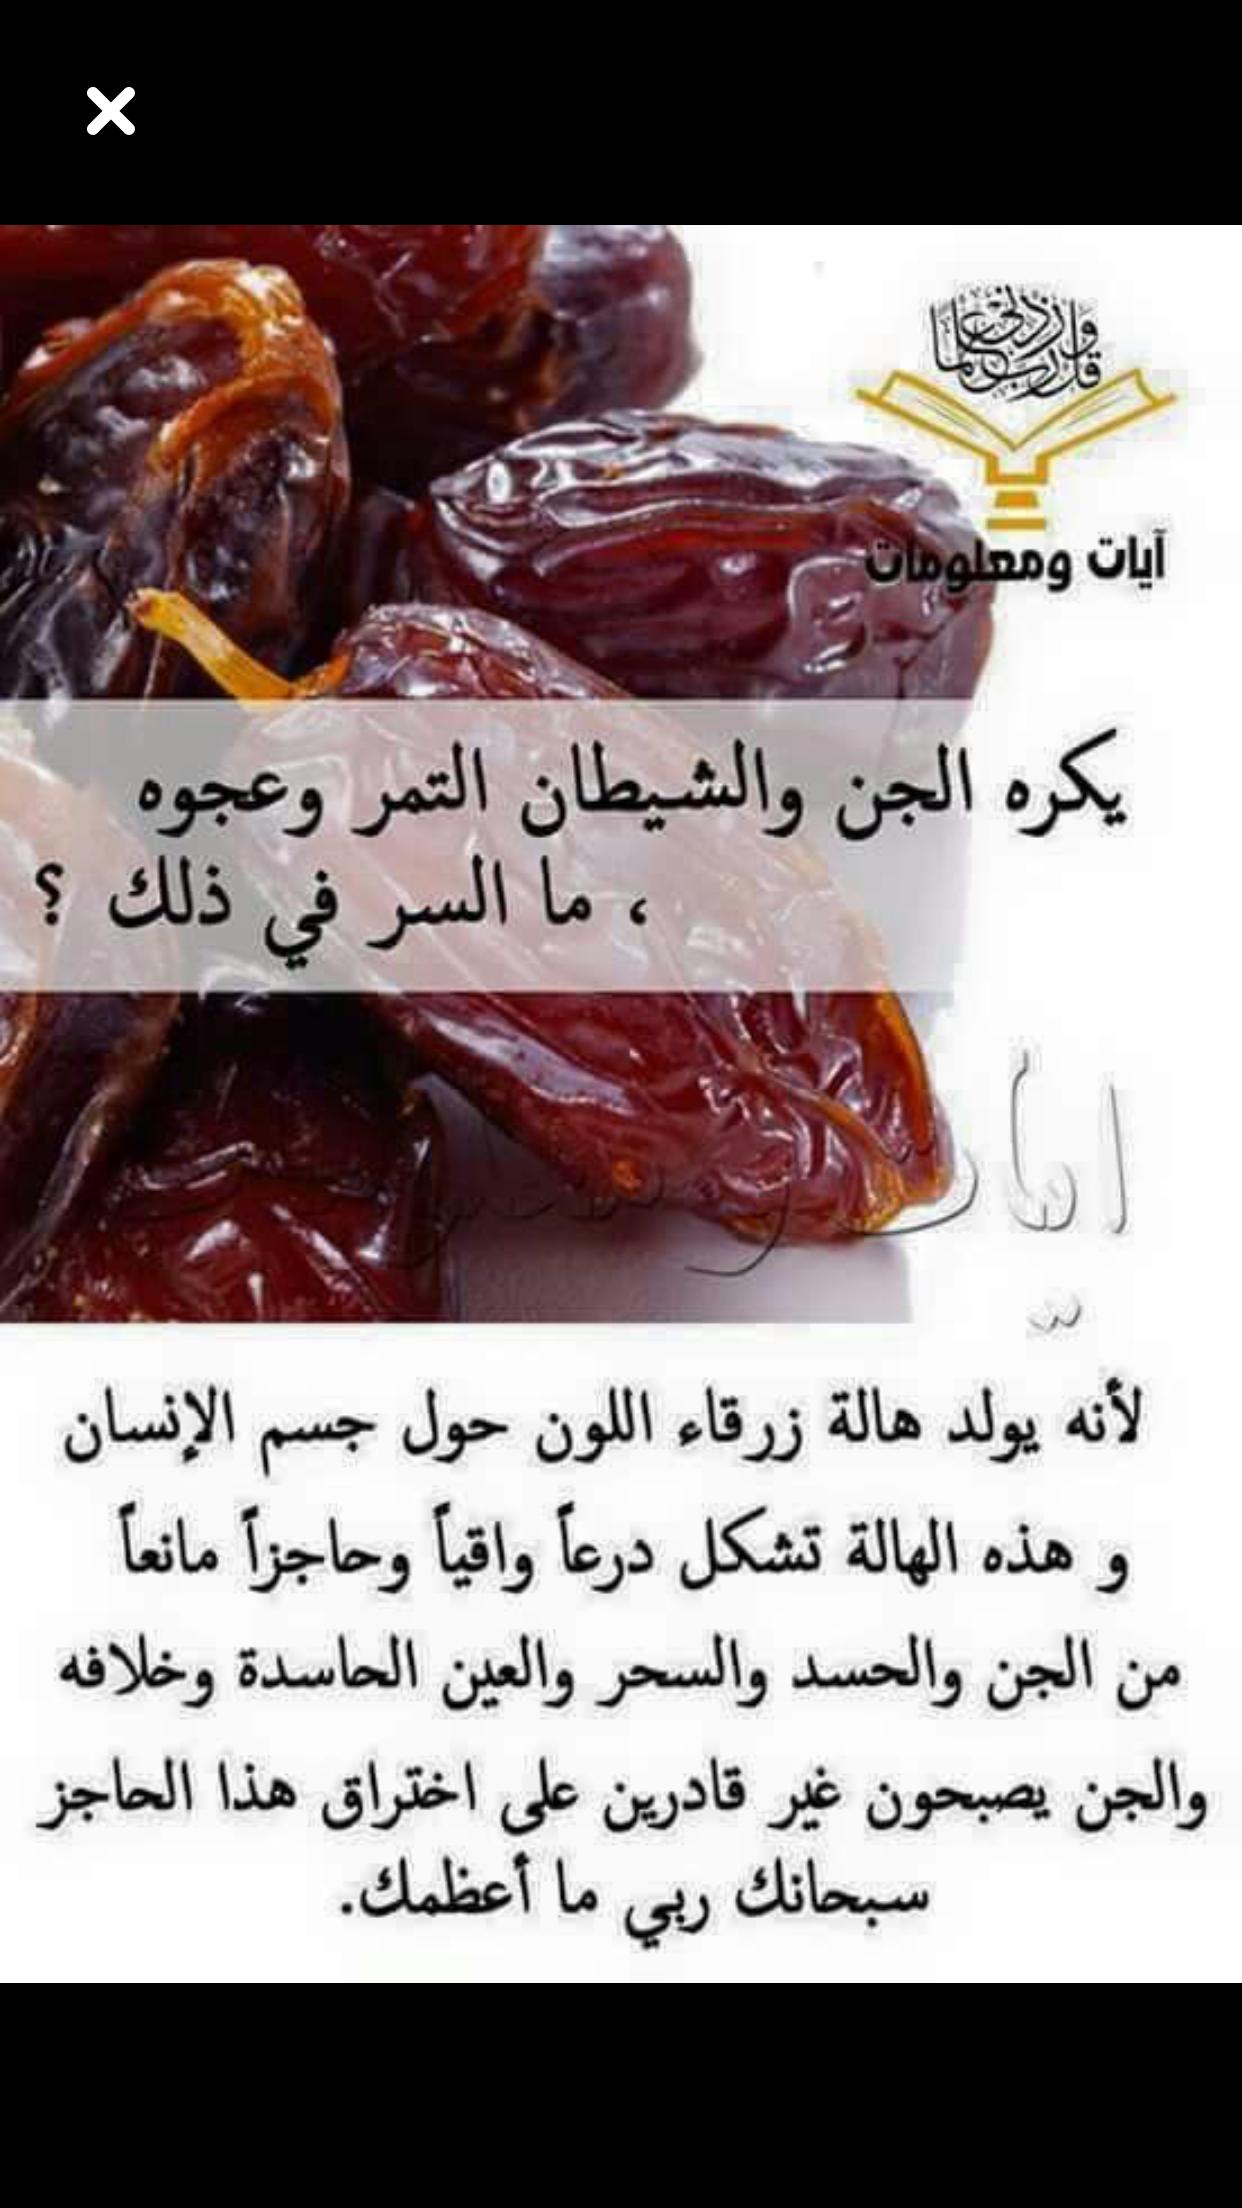 سبحانك ربي ما أعظمك Islam Facts Islam Beliefs Food Facts